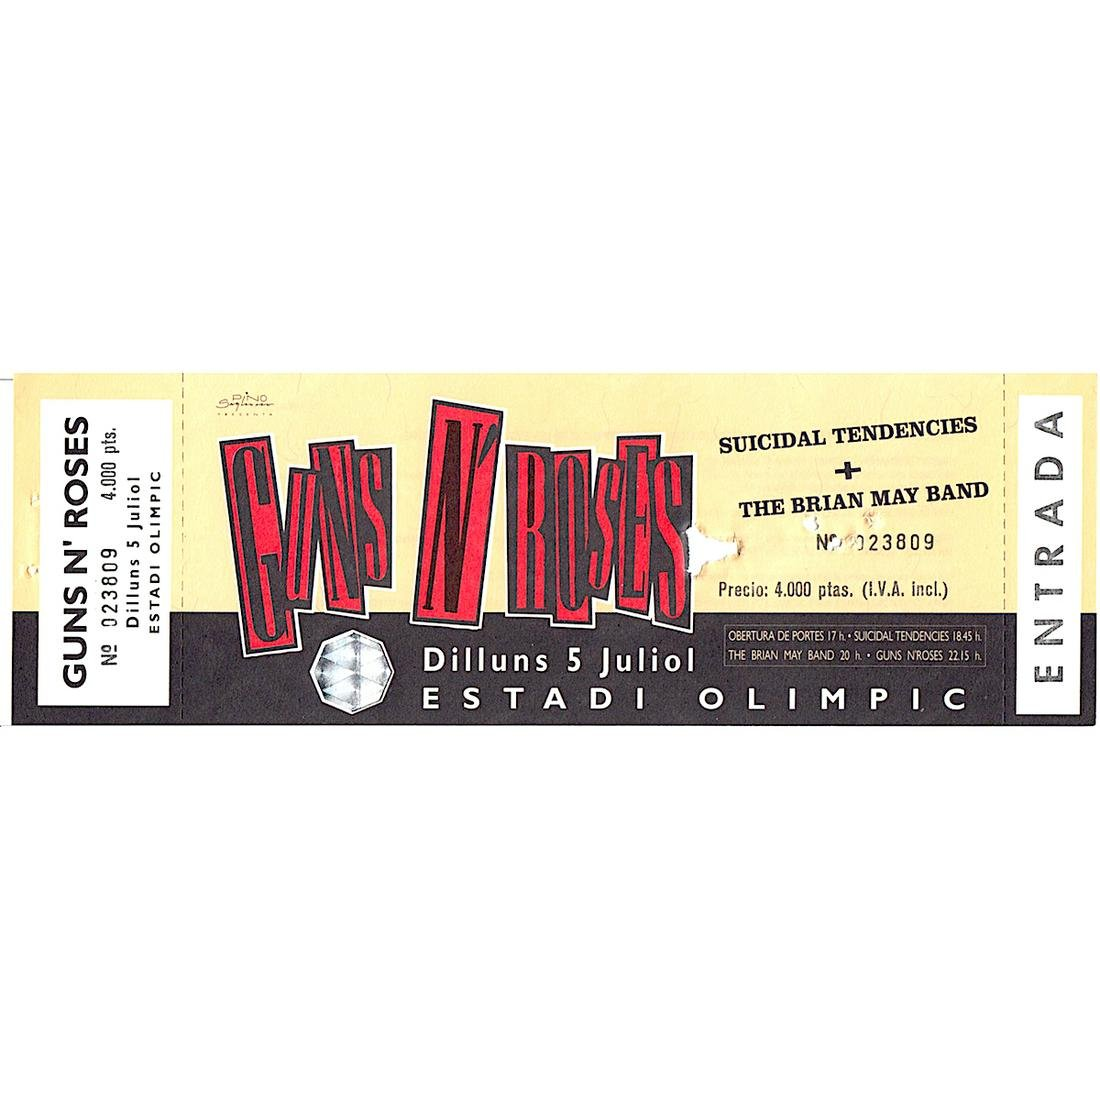 Guns N' Roses - 1993 Vintage Concert Ticket